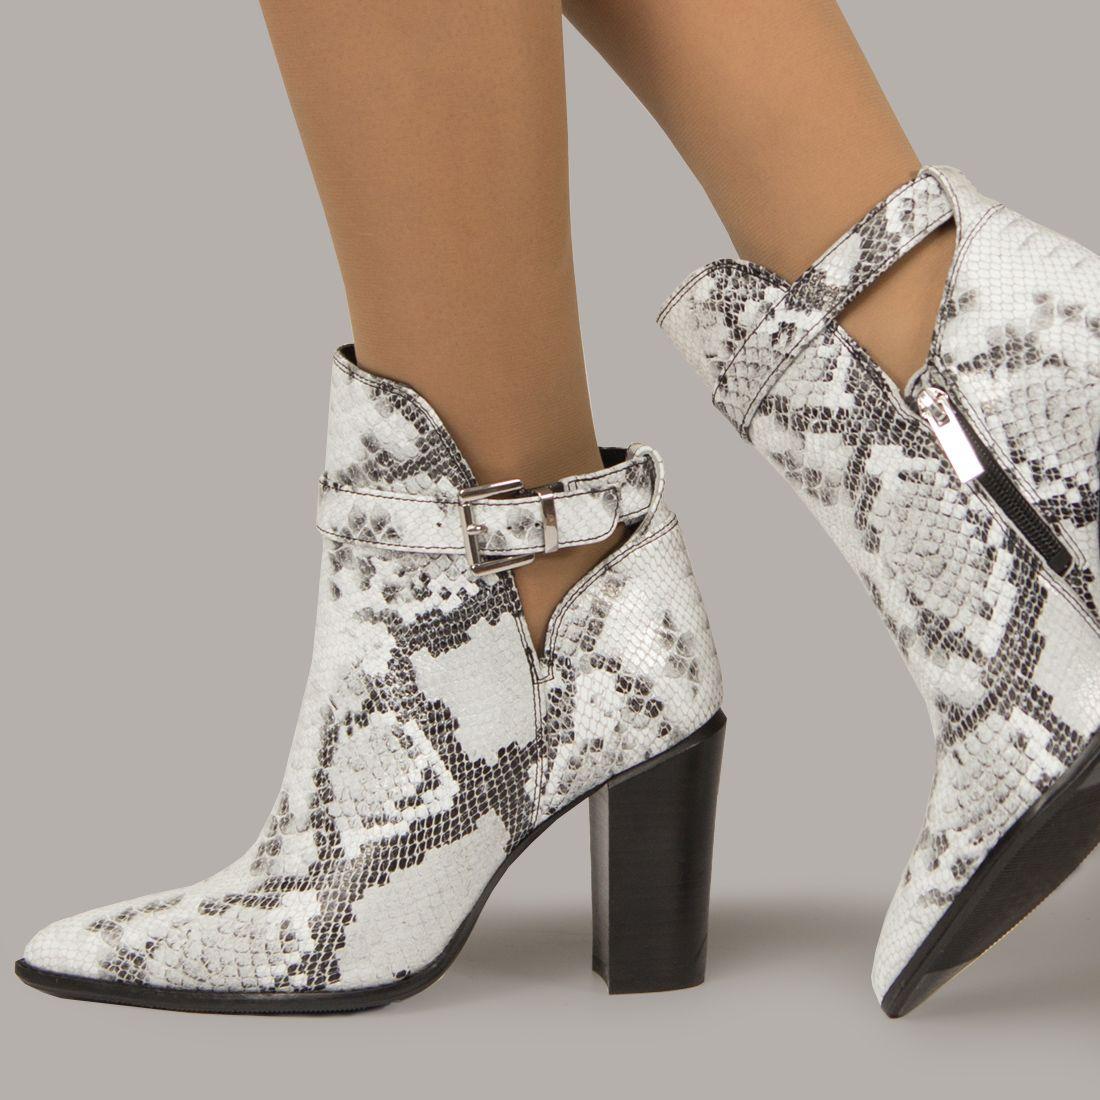 Paradoja Impuro Espolvorear  BRONX SHOES AMERICANA BOOT NAPPA ANIMAL PRINT Zacaris zapatos online. |  Marcas zapatos mujer, Zapatos, Zapatos para niñas